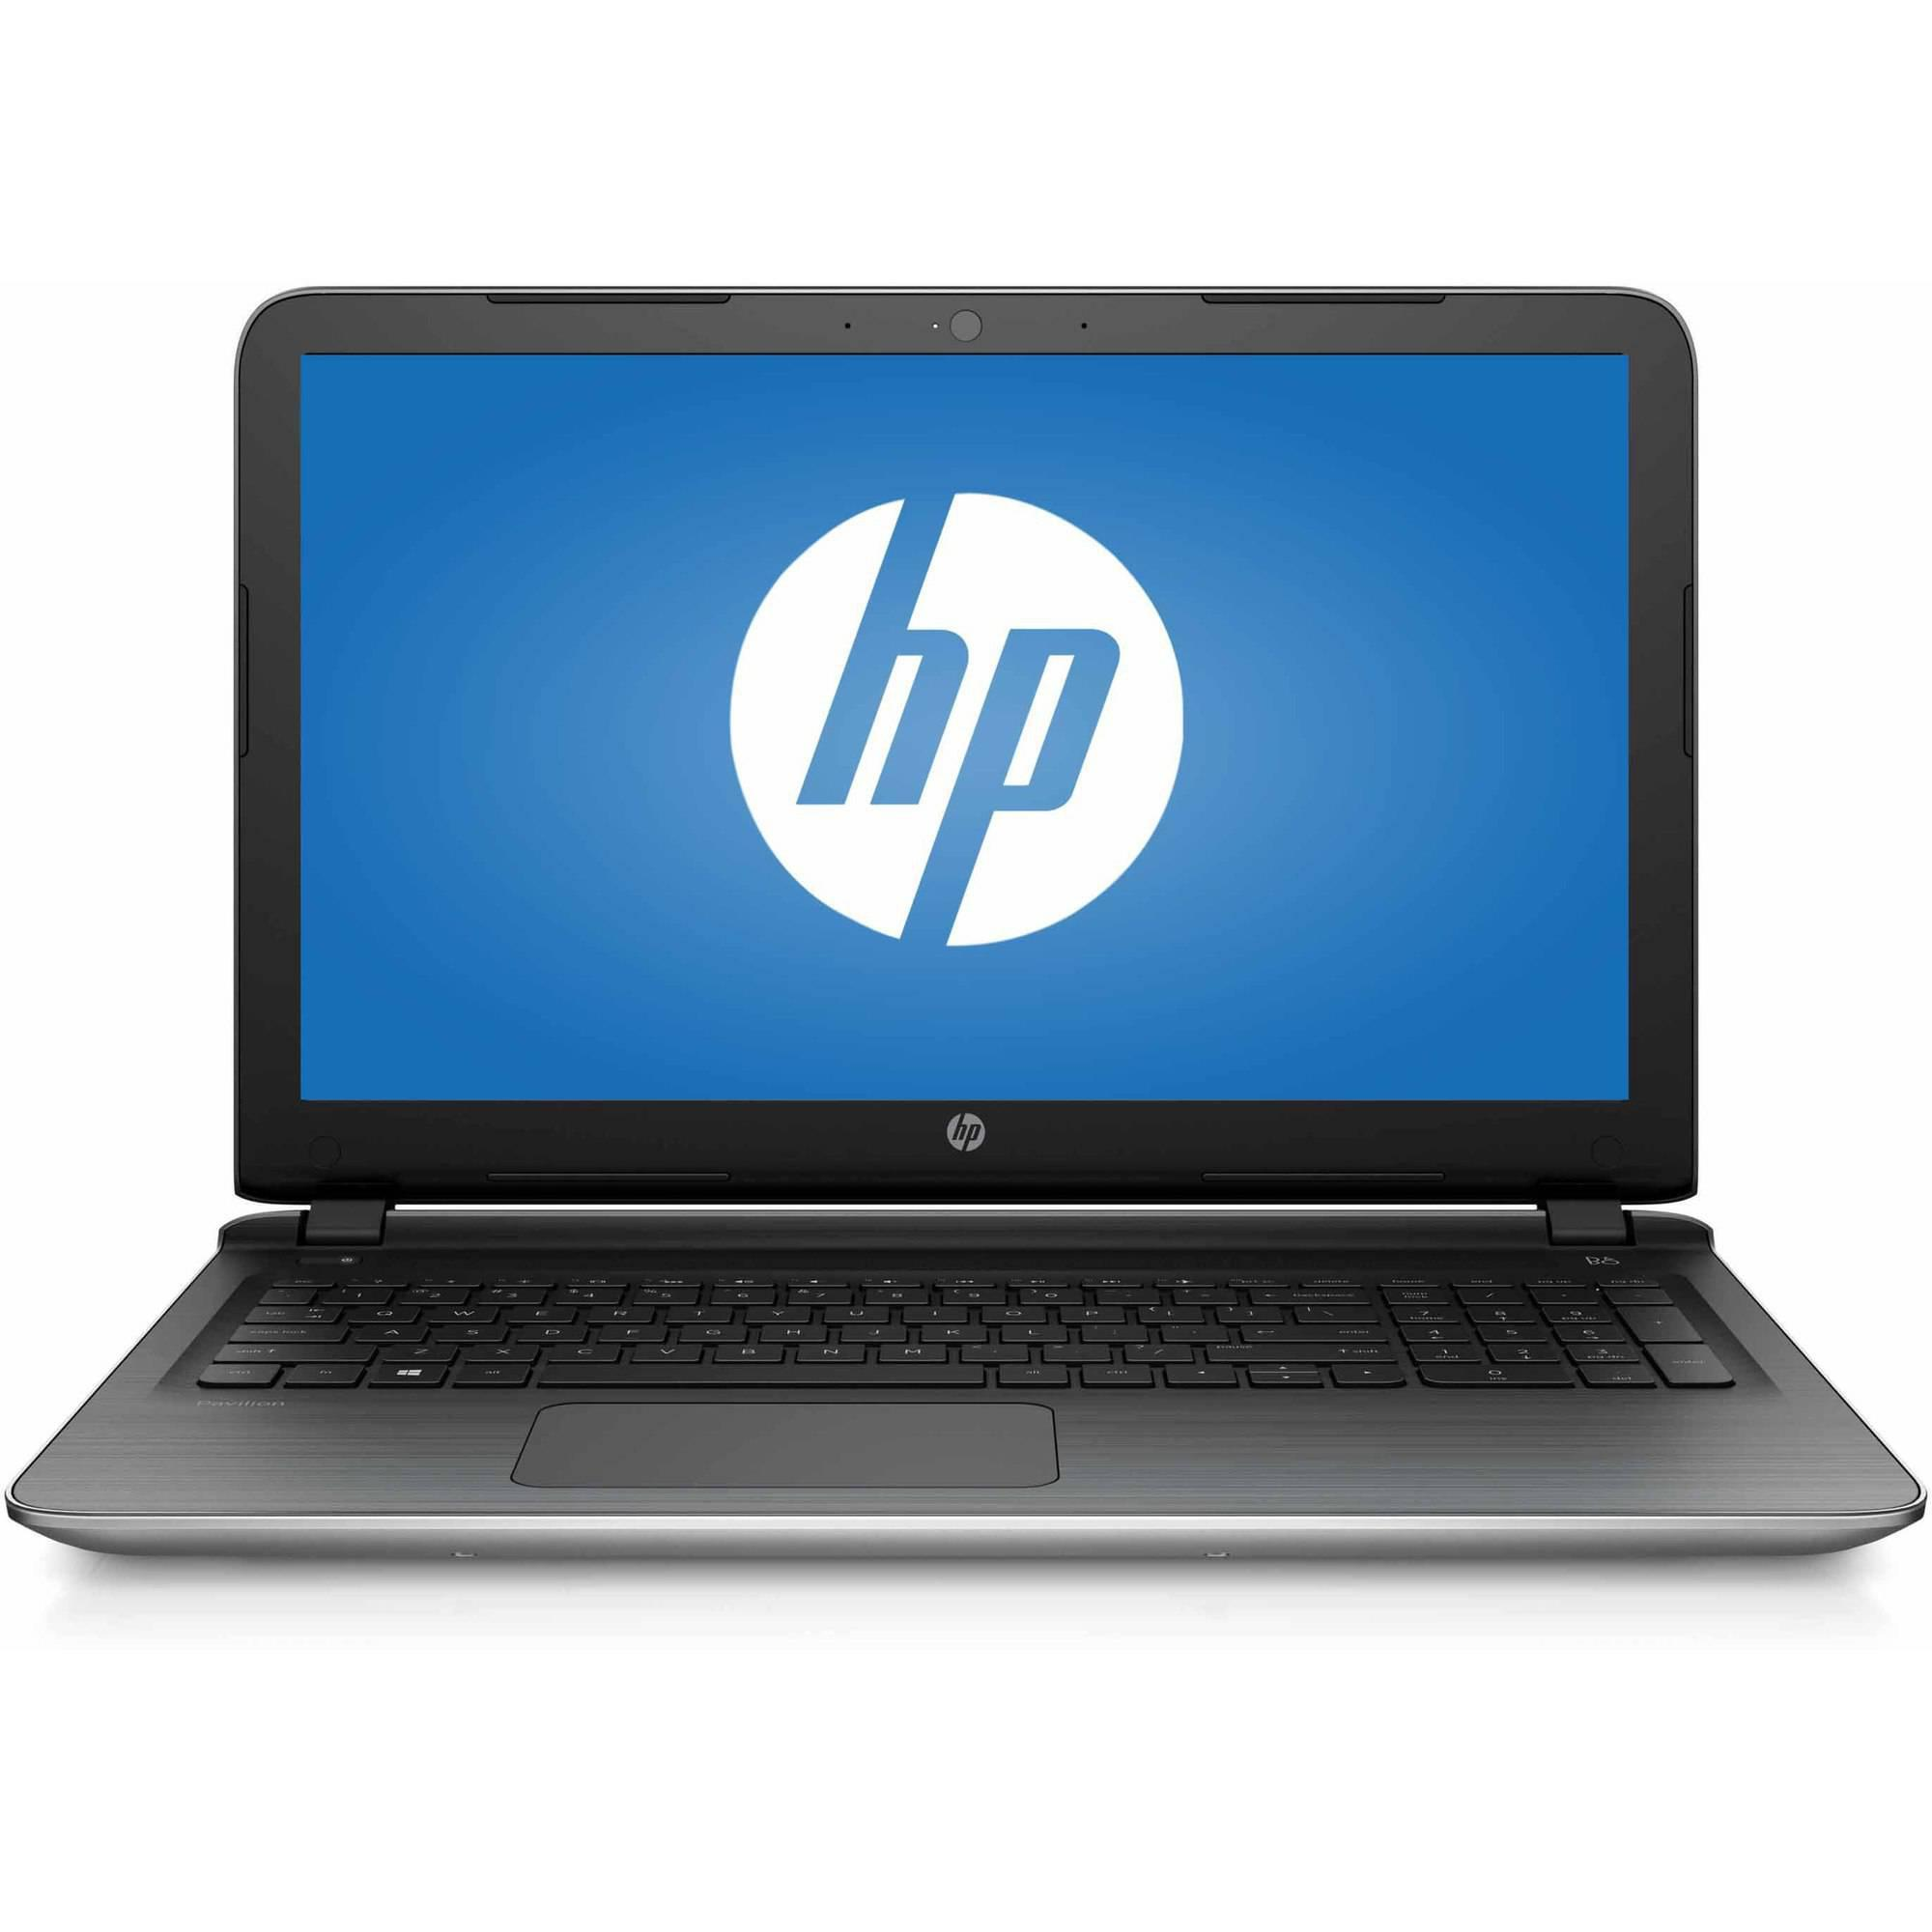 Hp notebook laptop windows 8 - Hp Silver 17 3 Pavilion 17 G121wm Laptop Pc With Amd A10 8700p Processor 8gb Memory 1tb Hard Drive And Windows 10 Home Walmart Com